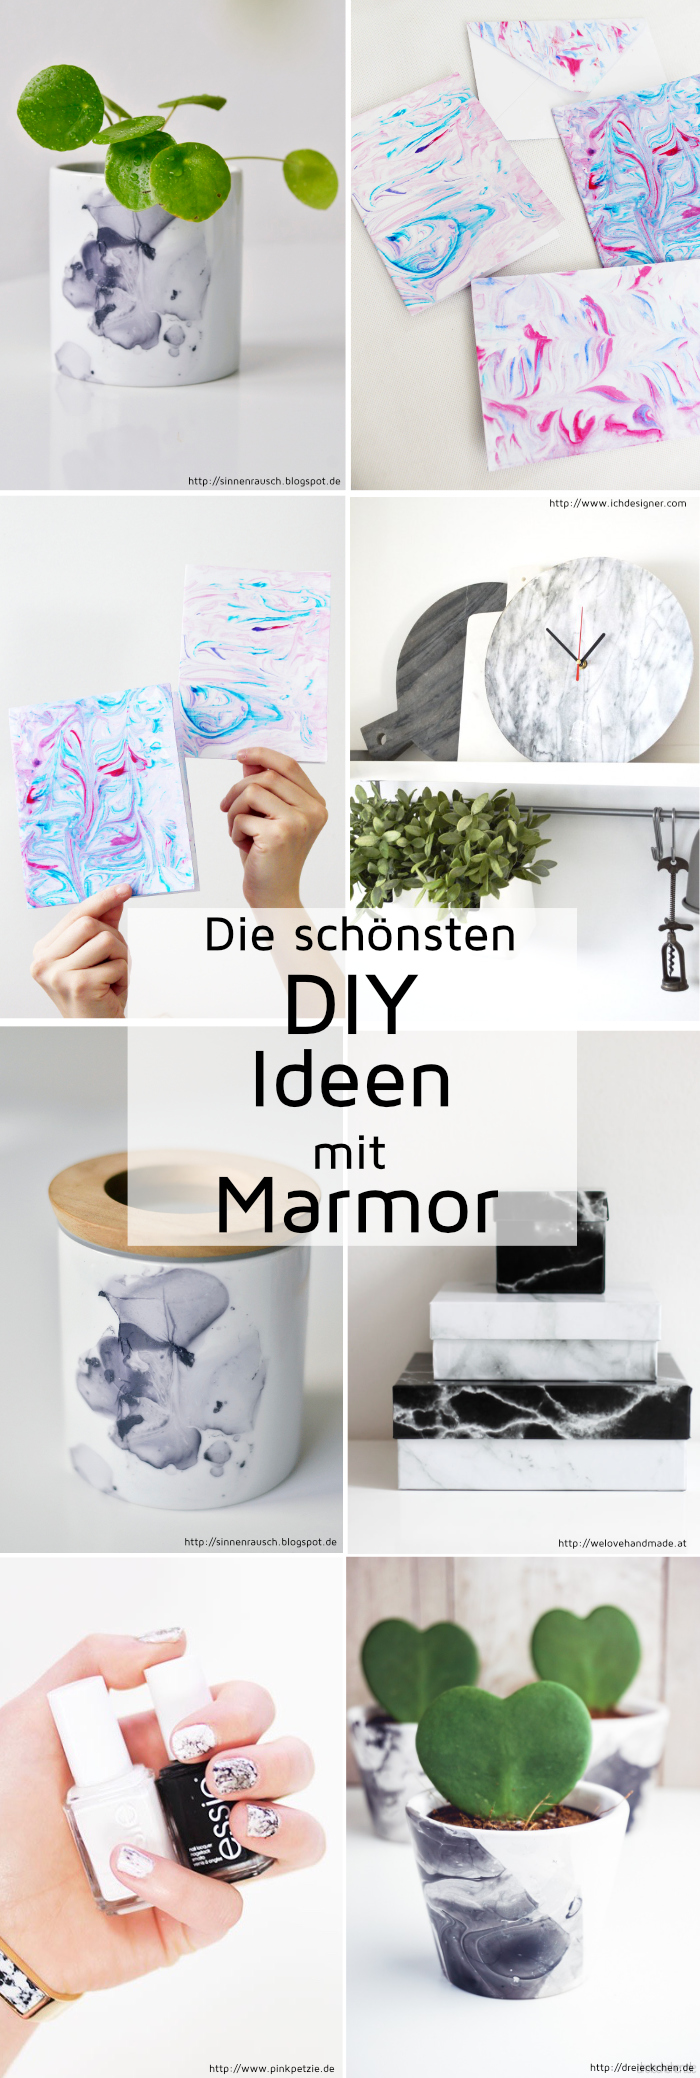 Die-schoensten-DIY-Ideen-mit-Marmor-DIY-Blog-Marmorieren